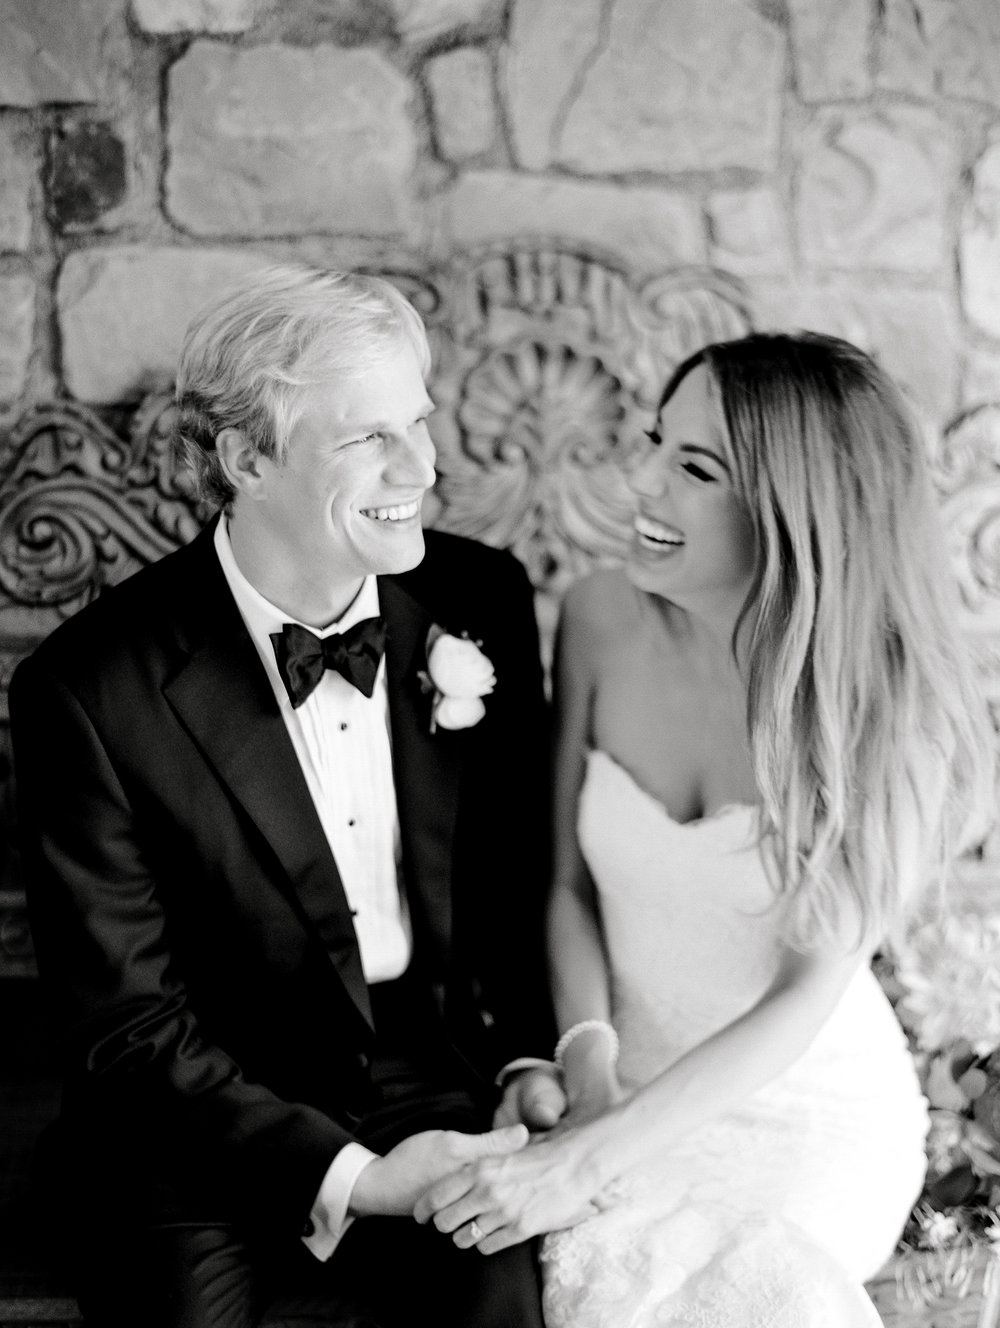 Escondido-Golf_Lake-Club-Hill-Country-Houston-Wedding-Photographer-Best-Top-Luxury-Destination-Engagements-Portrait-Austin-Photography-16.jpg